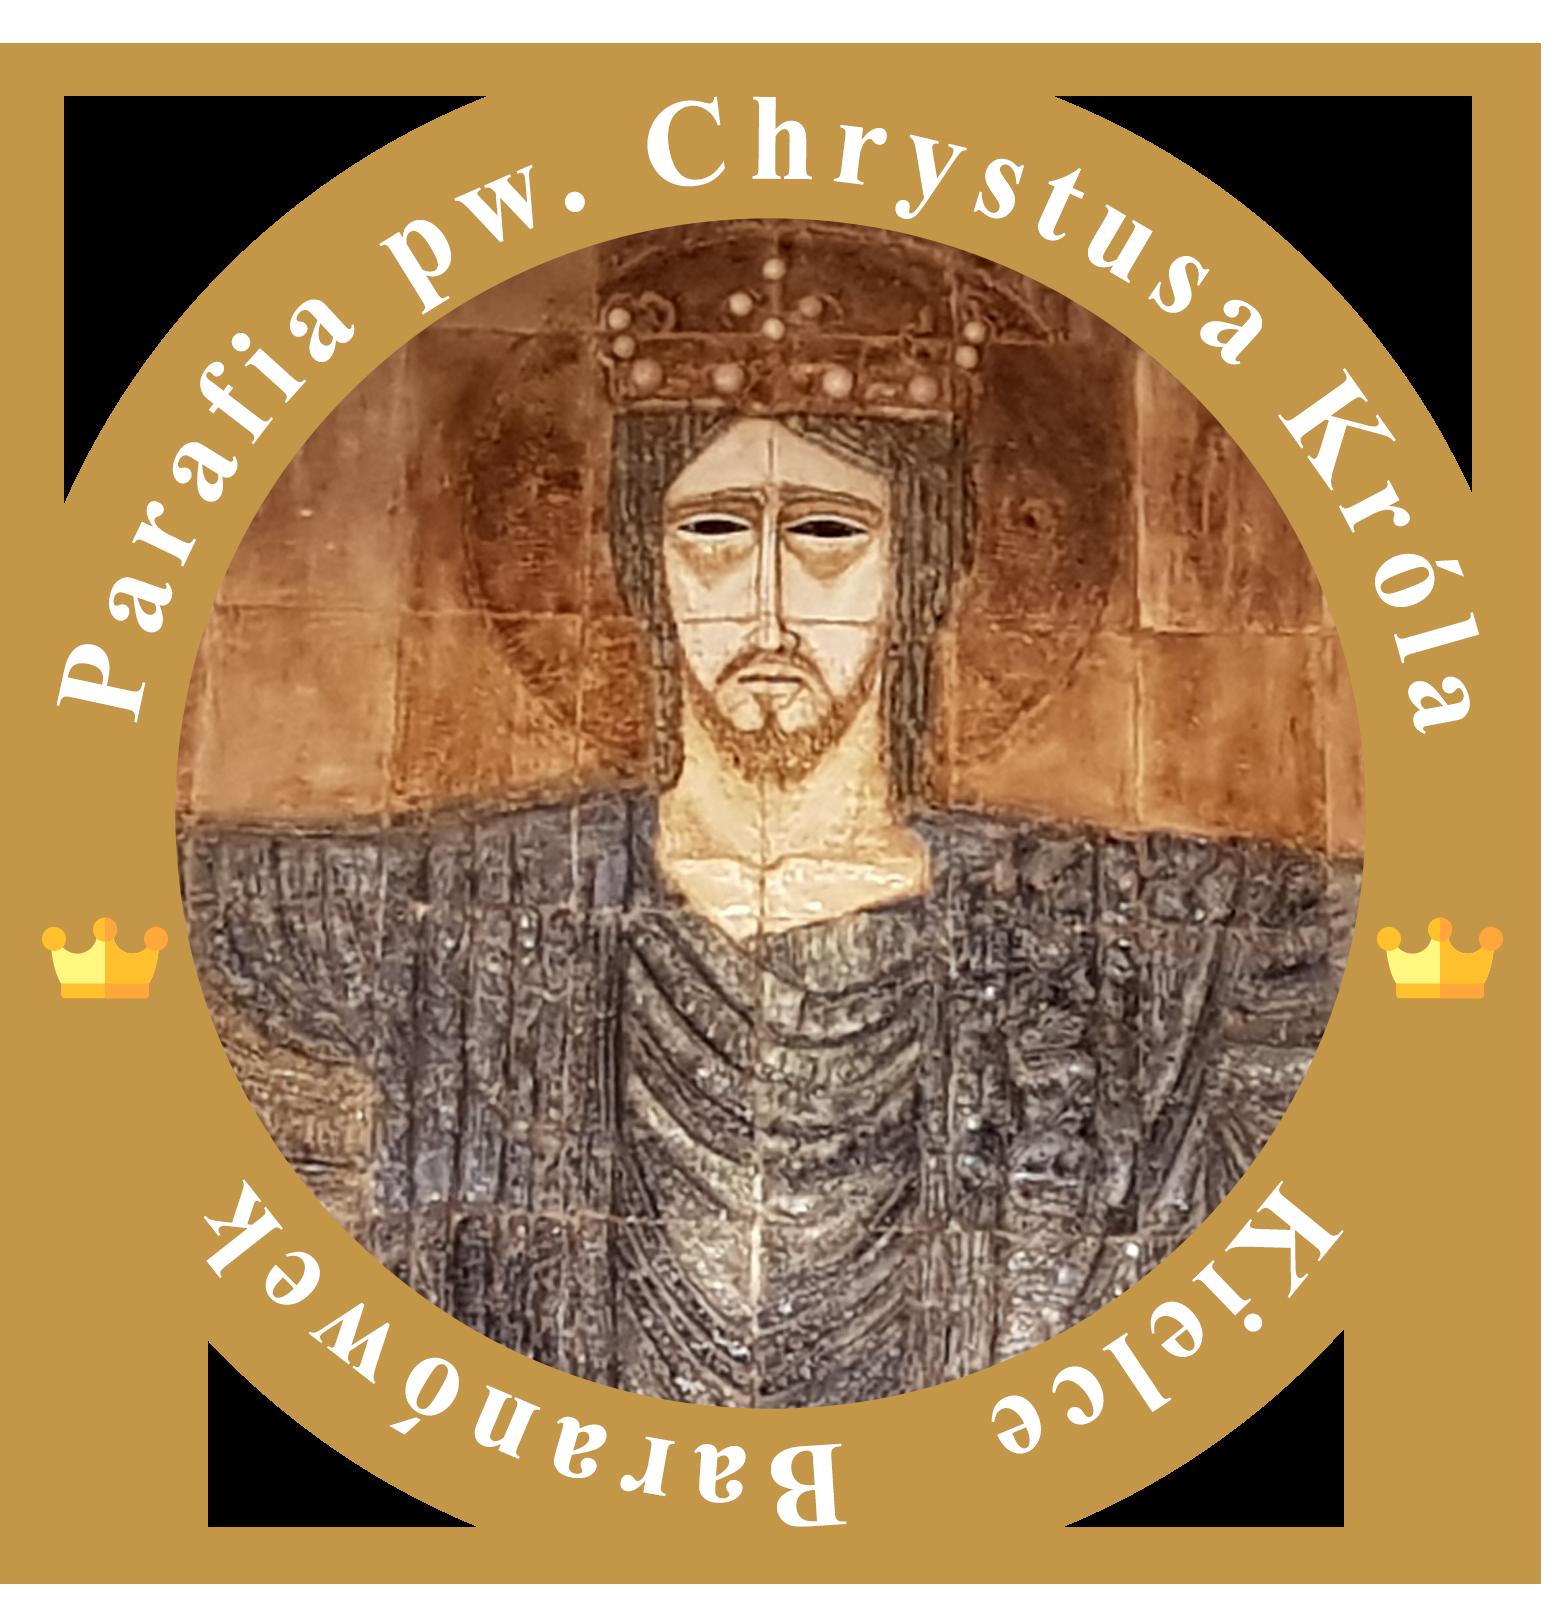 Parafia Chrystusa Króla w Kielcach